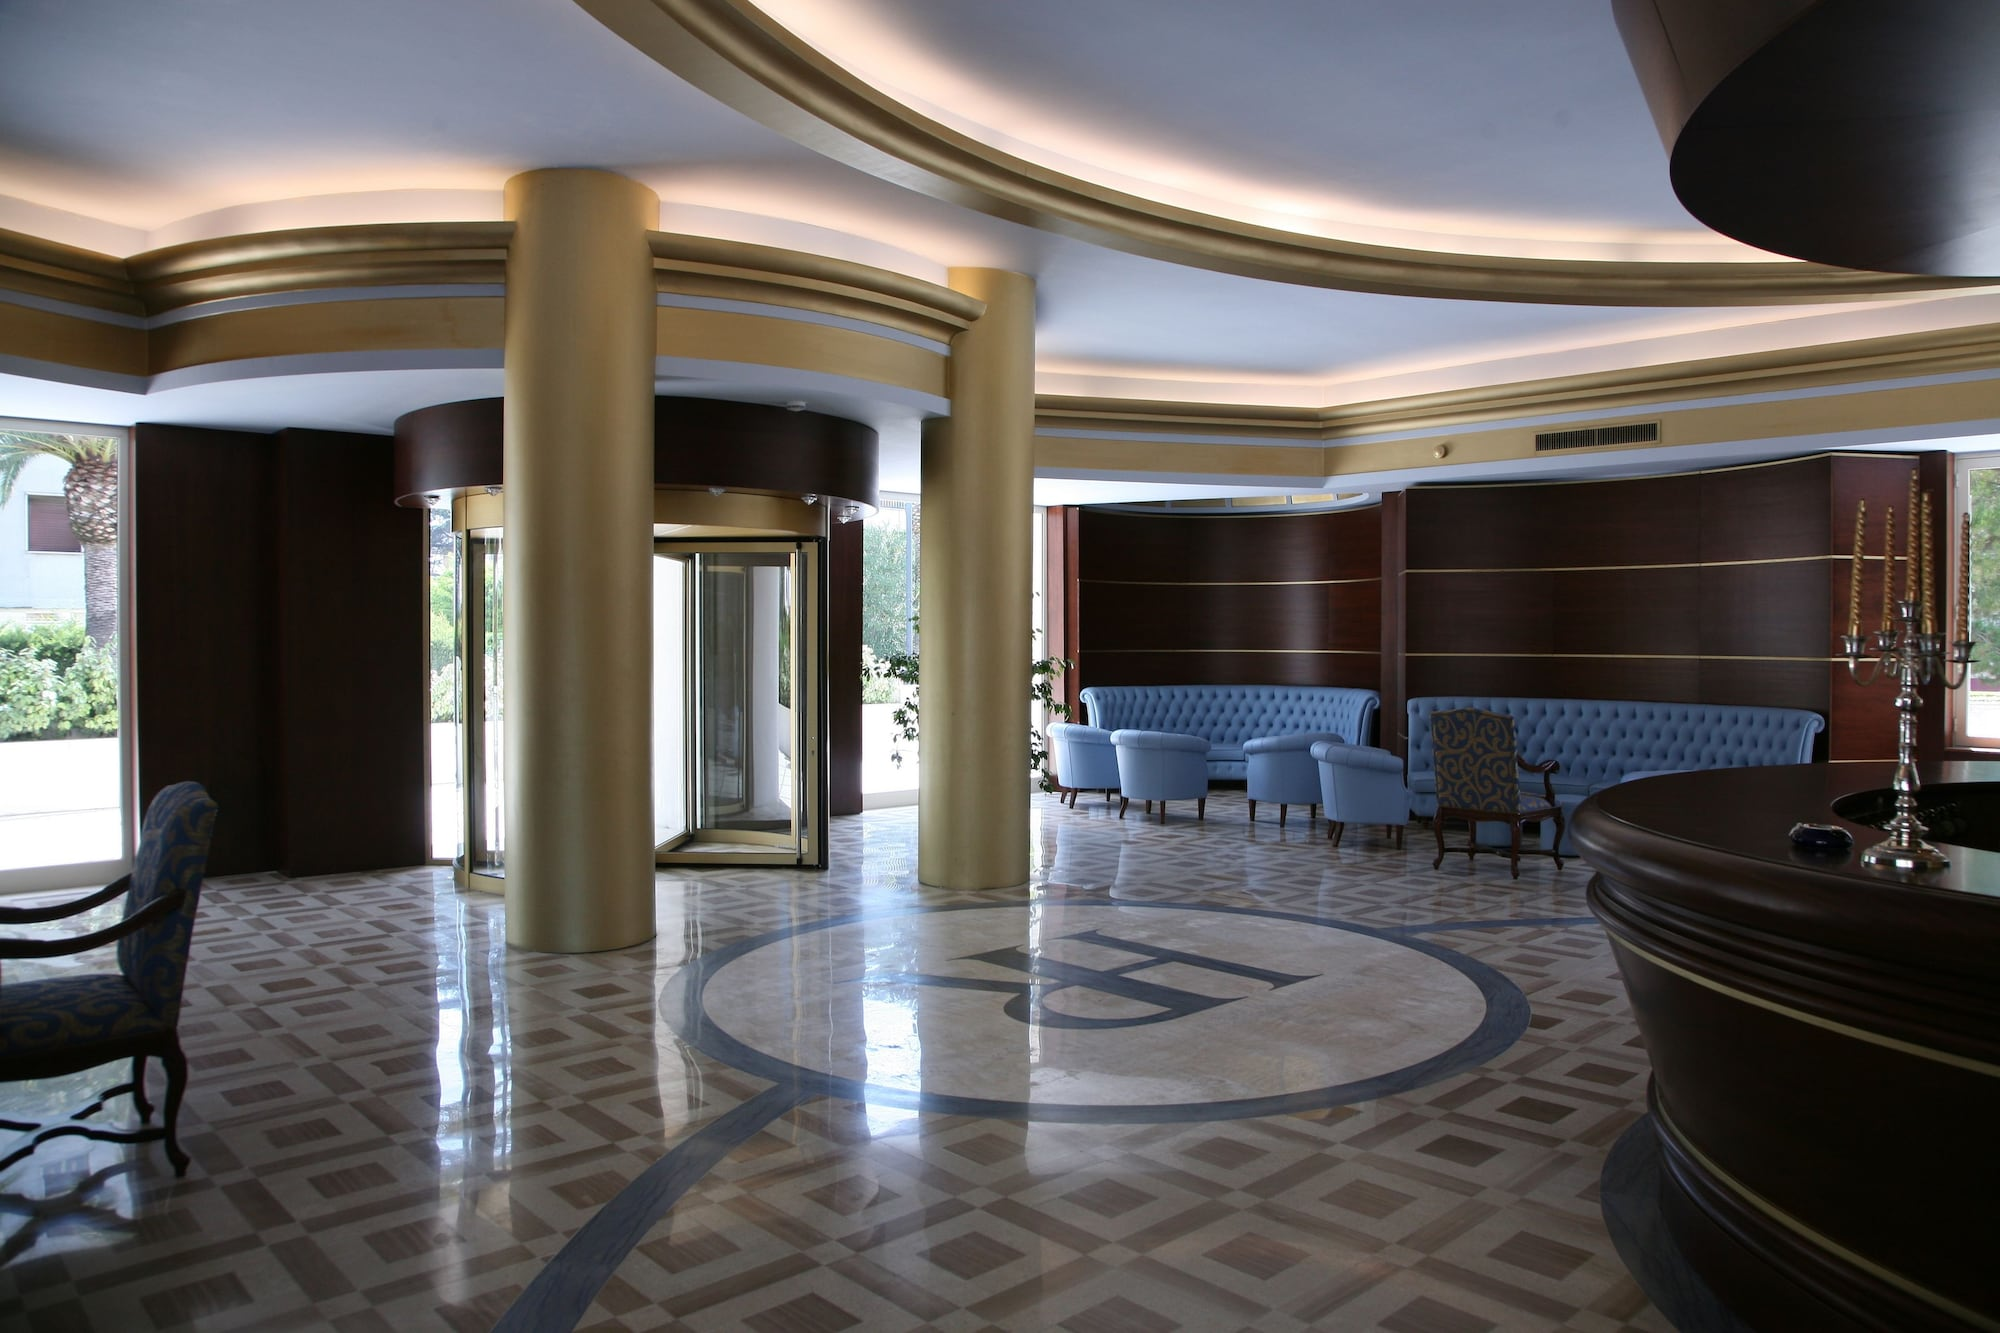 Hotel Royal, Chieti